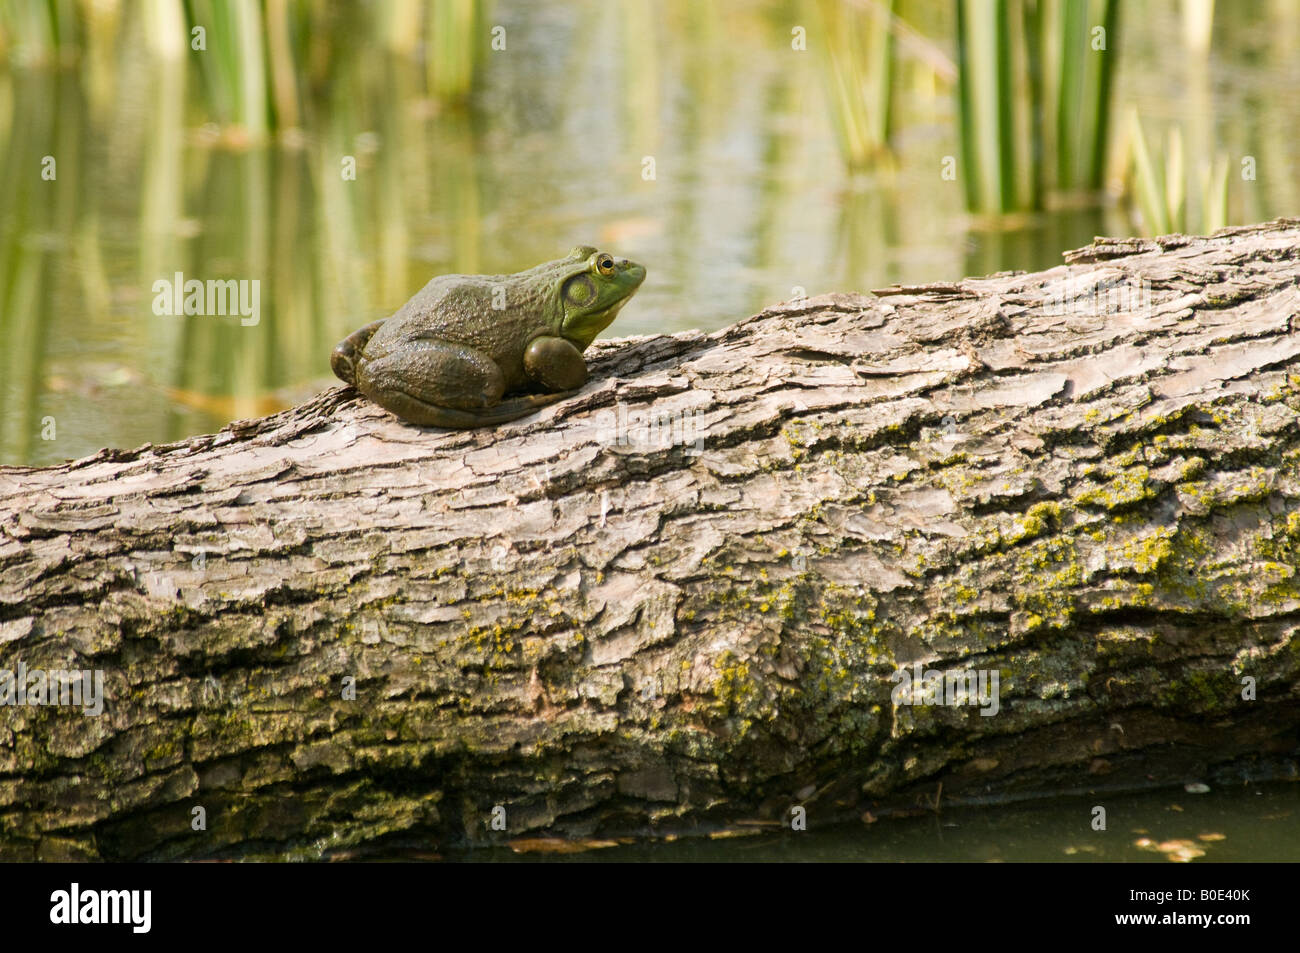 American bullfrog on log Stock Photo